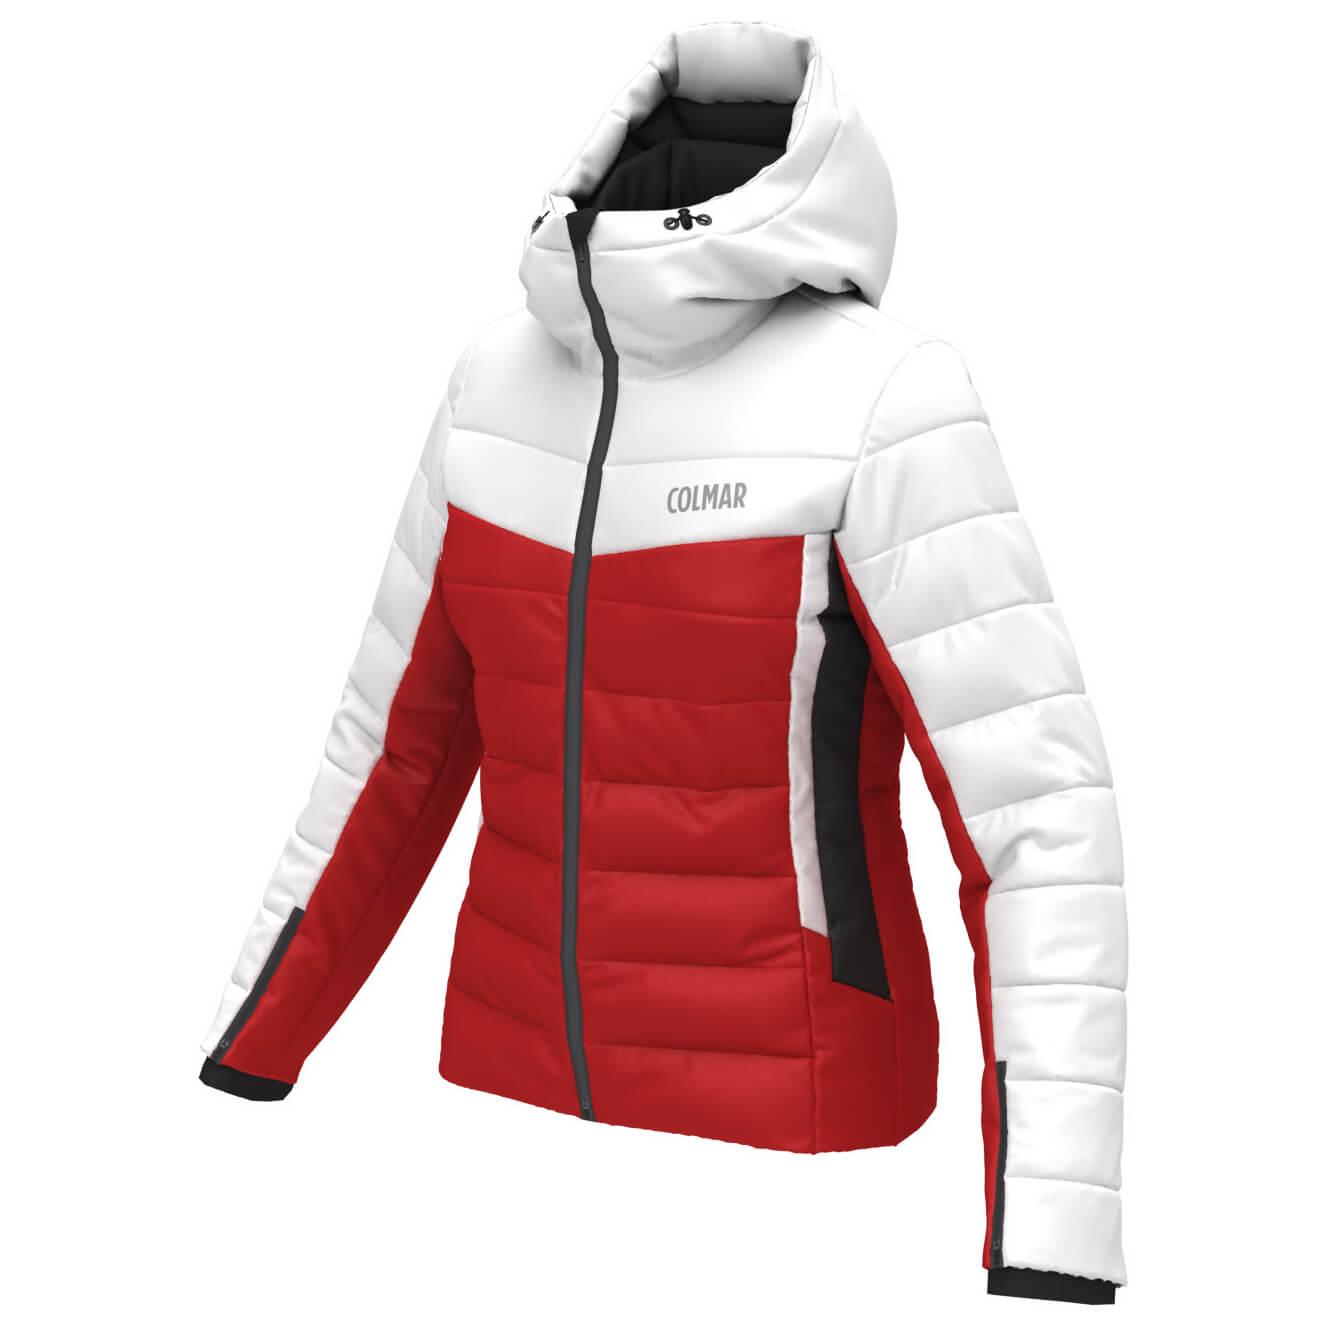 Colmar Active Sapporo Jacket Giacca da sci Donna